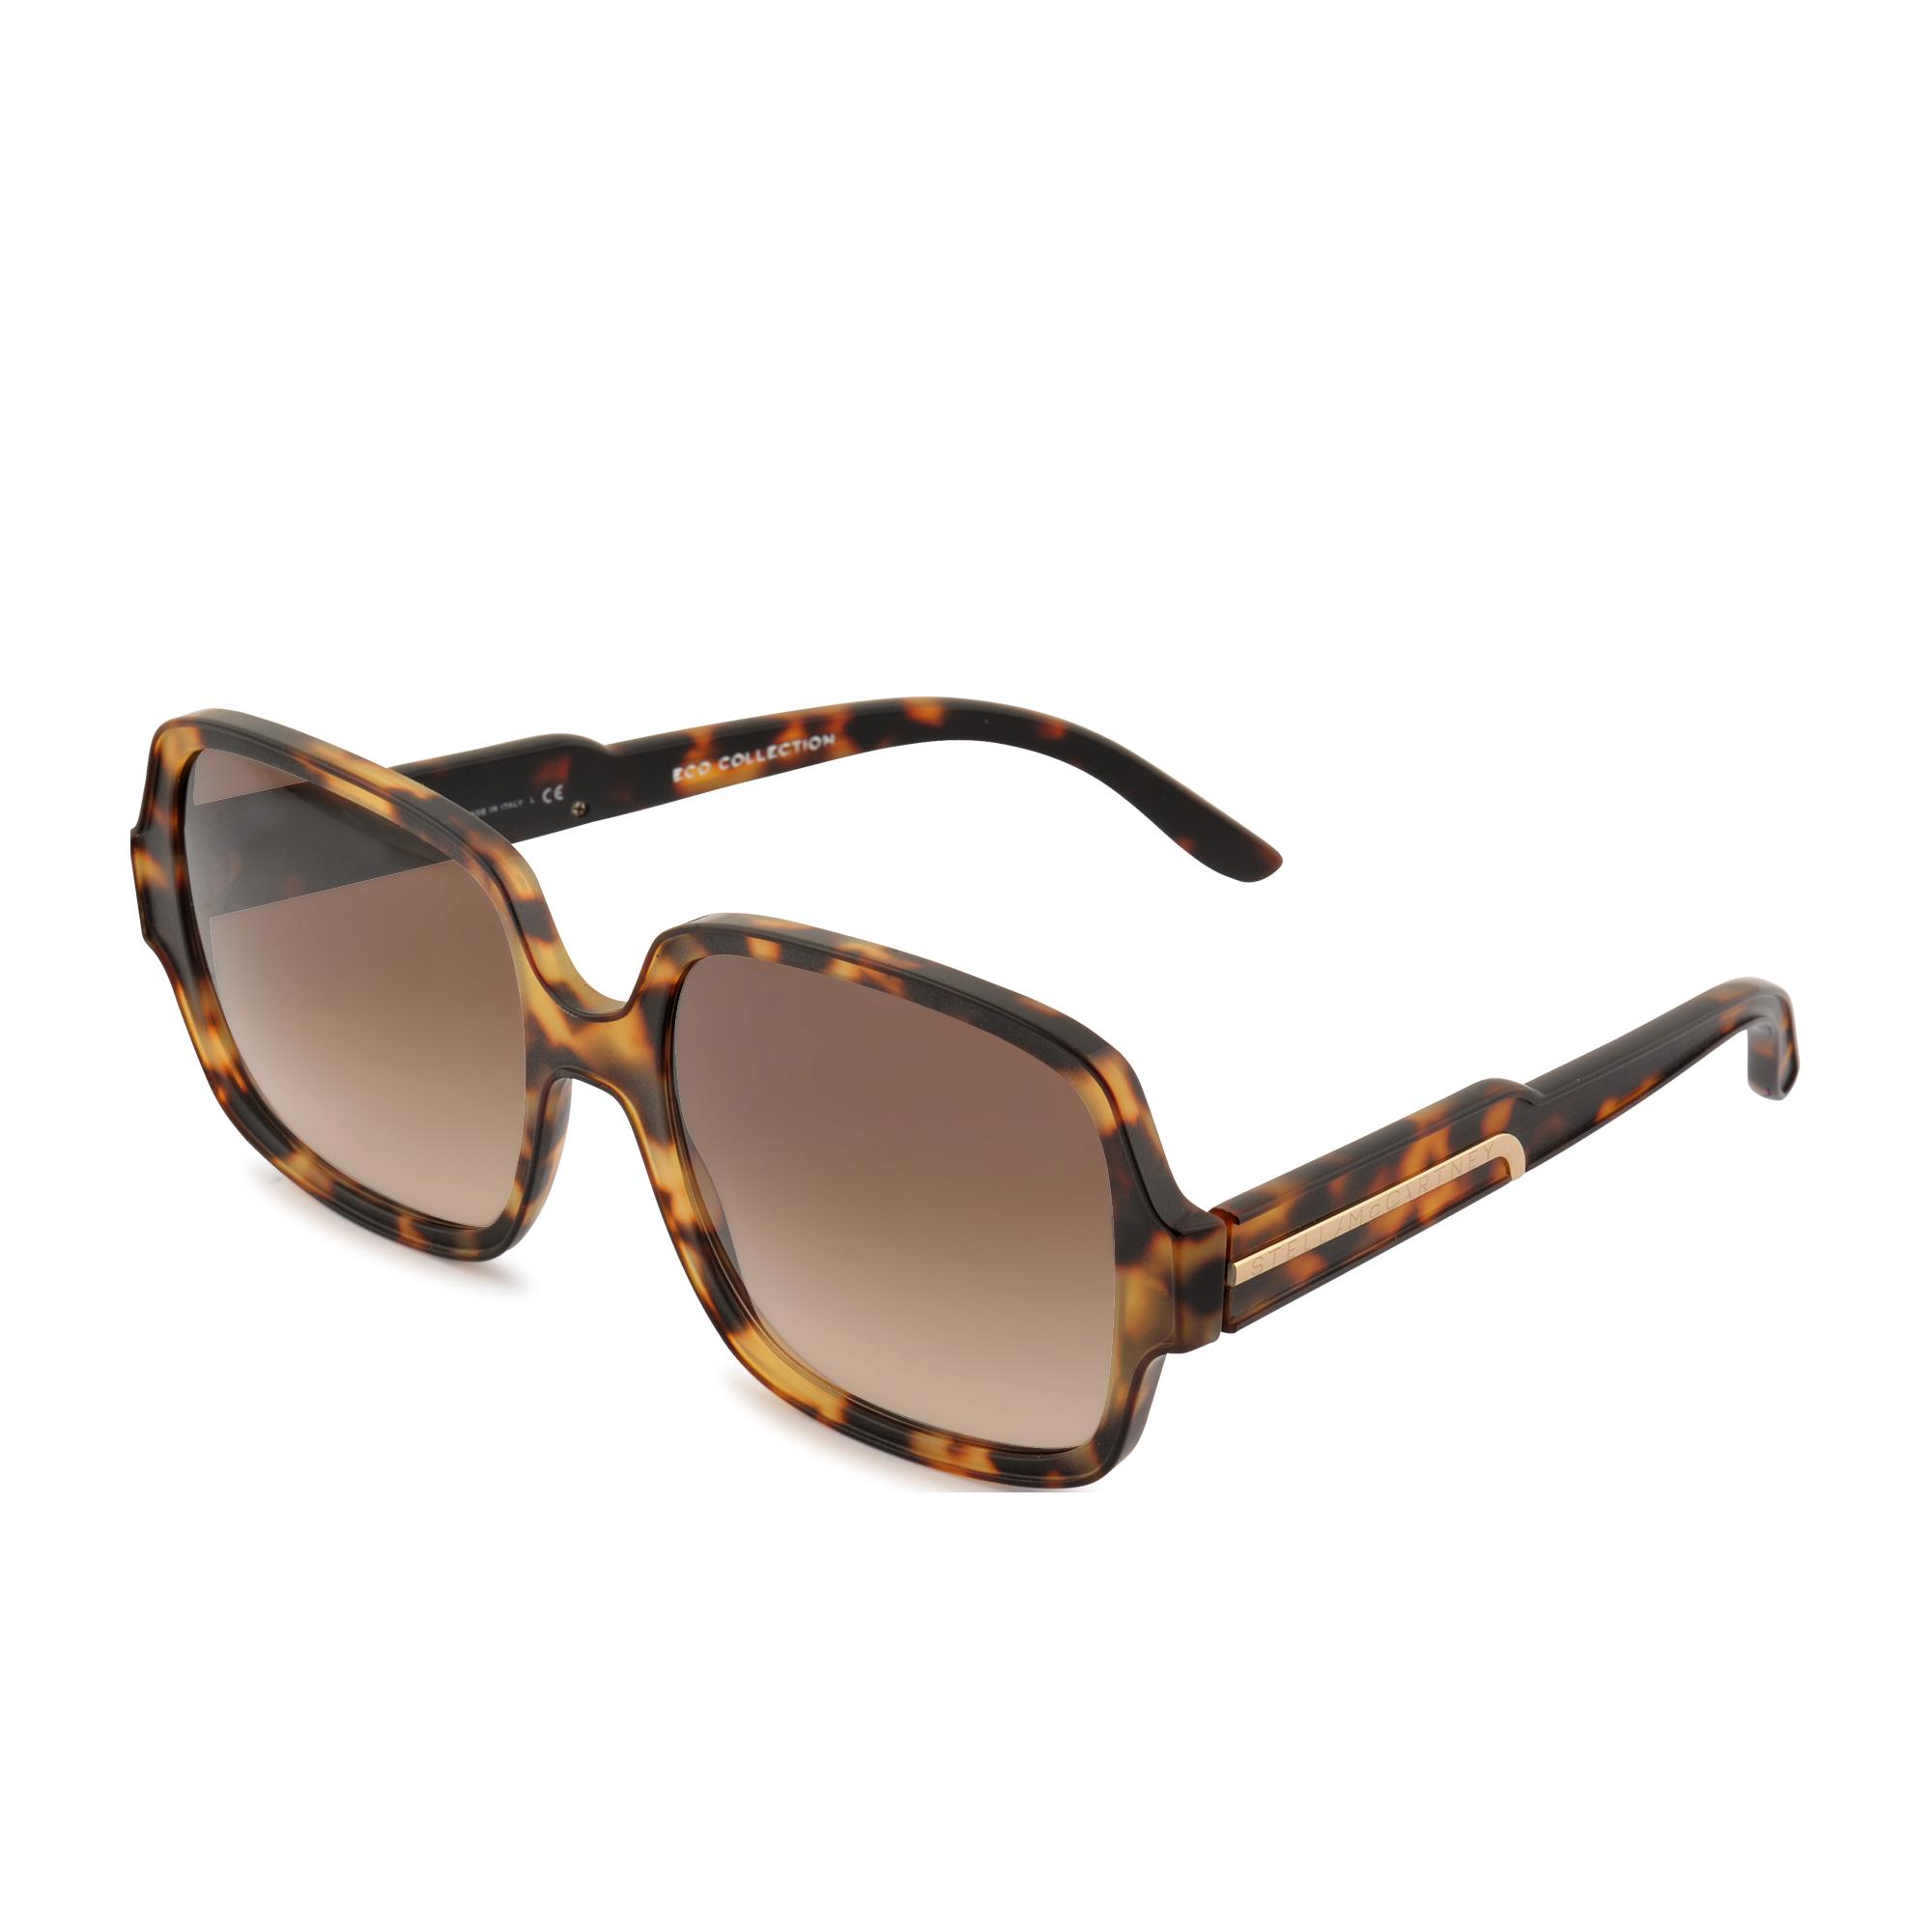 Stella McCartney Sonnenbrille SM4055 9Wul5